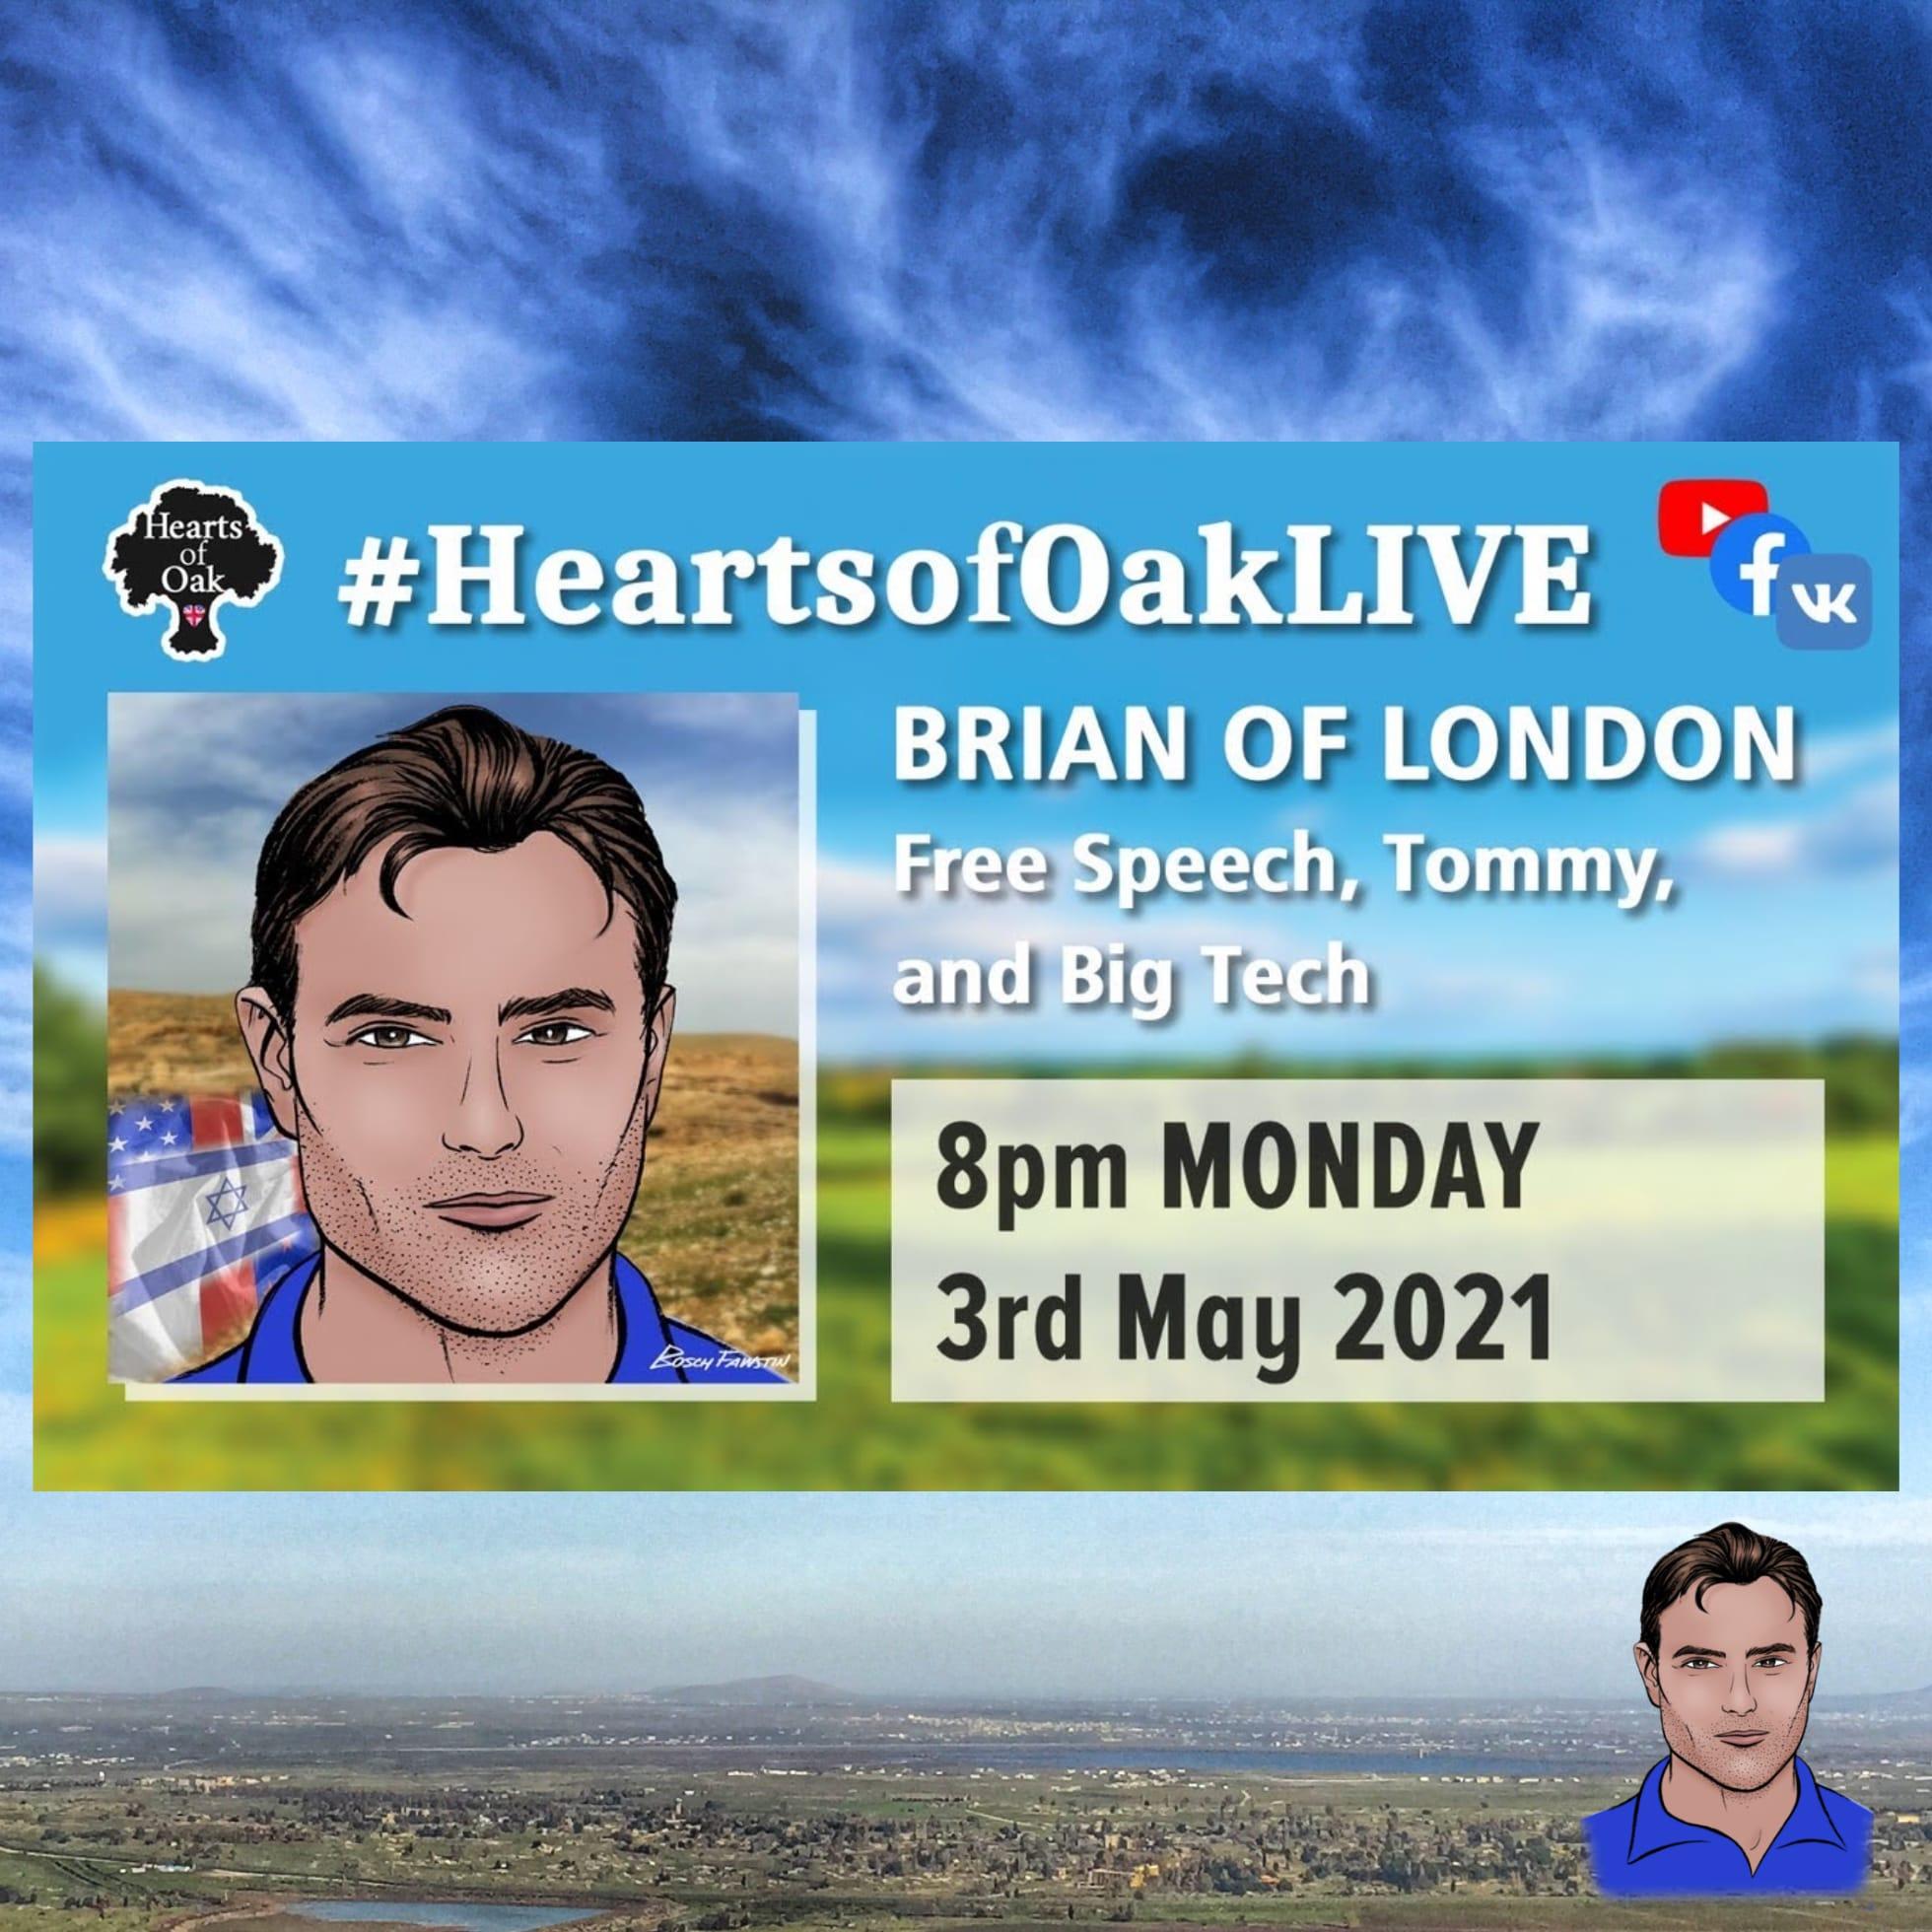 Brian of London